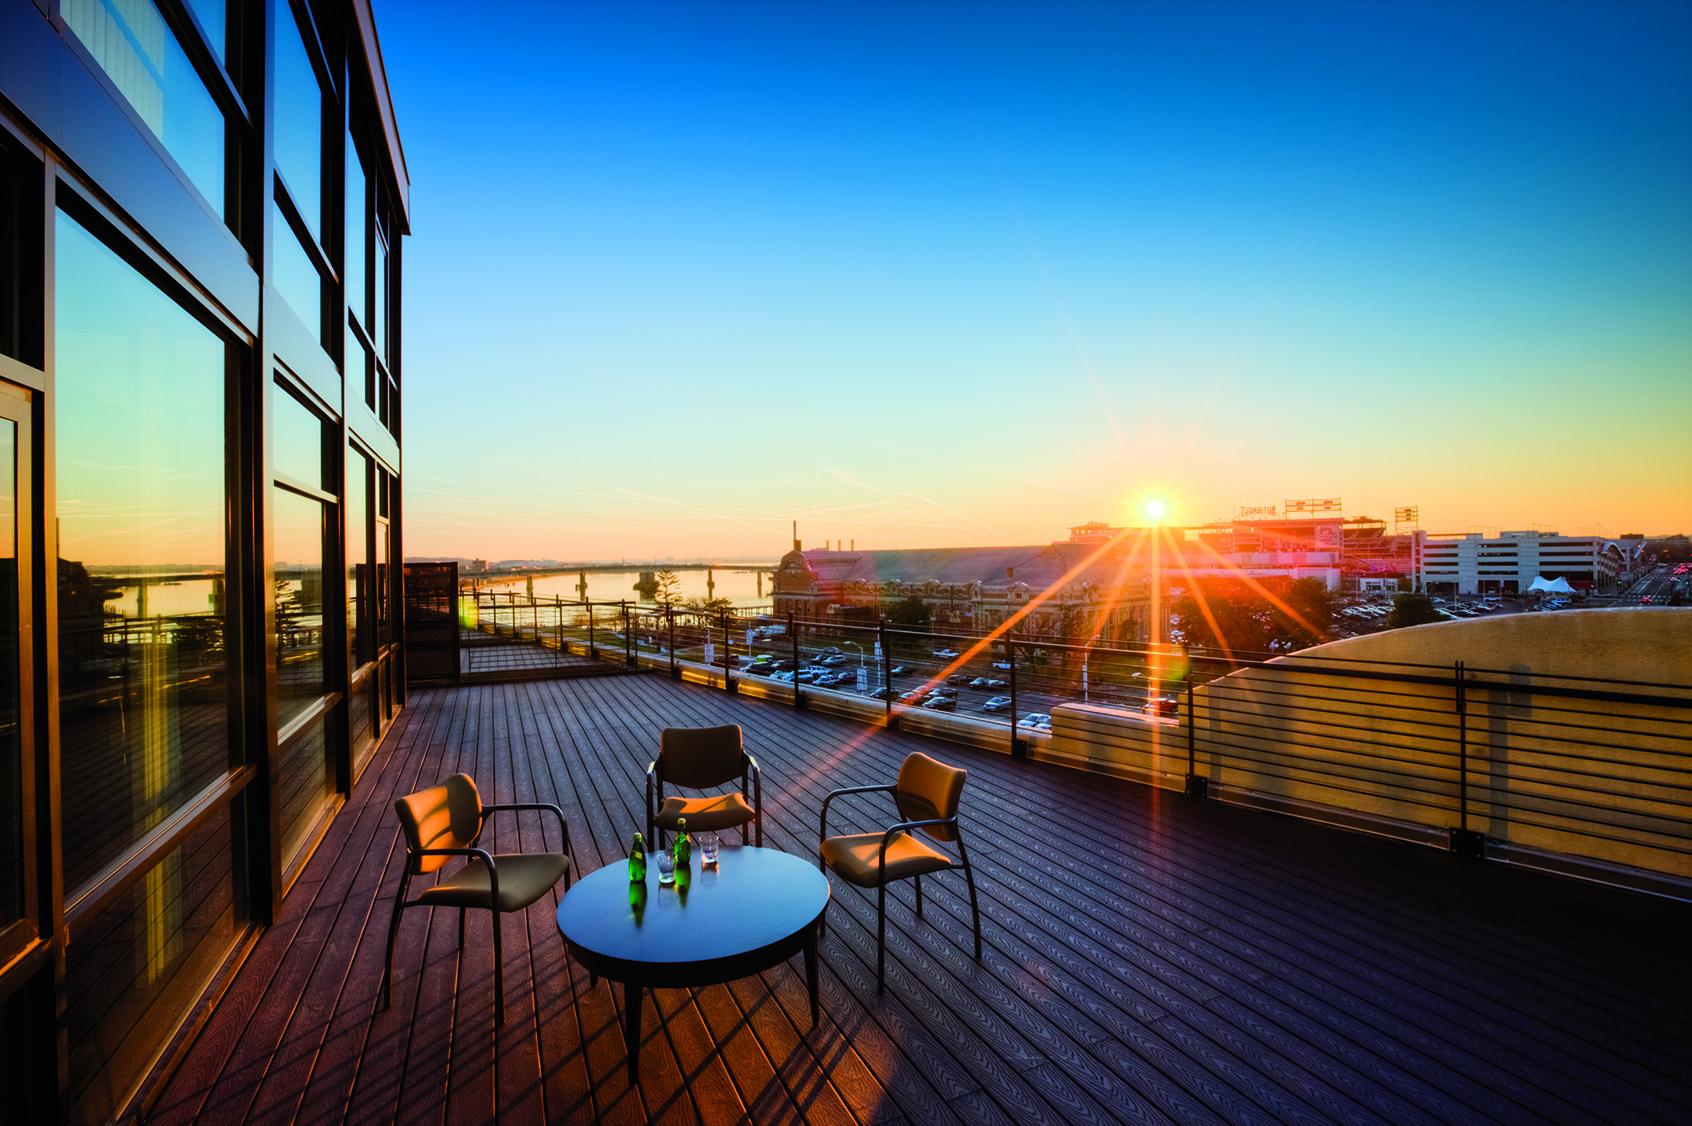 Penthouse apartment balcony